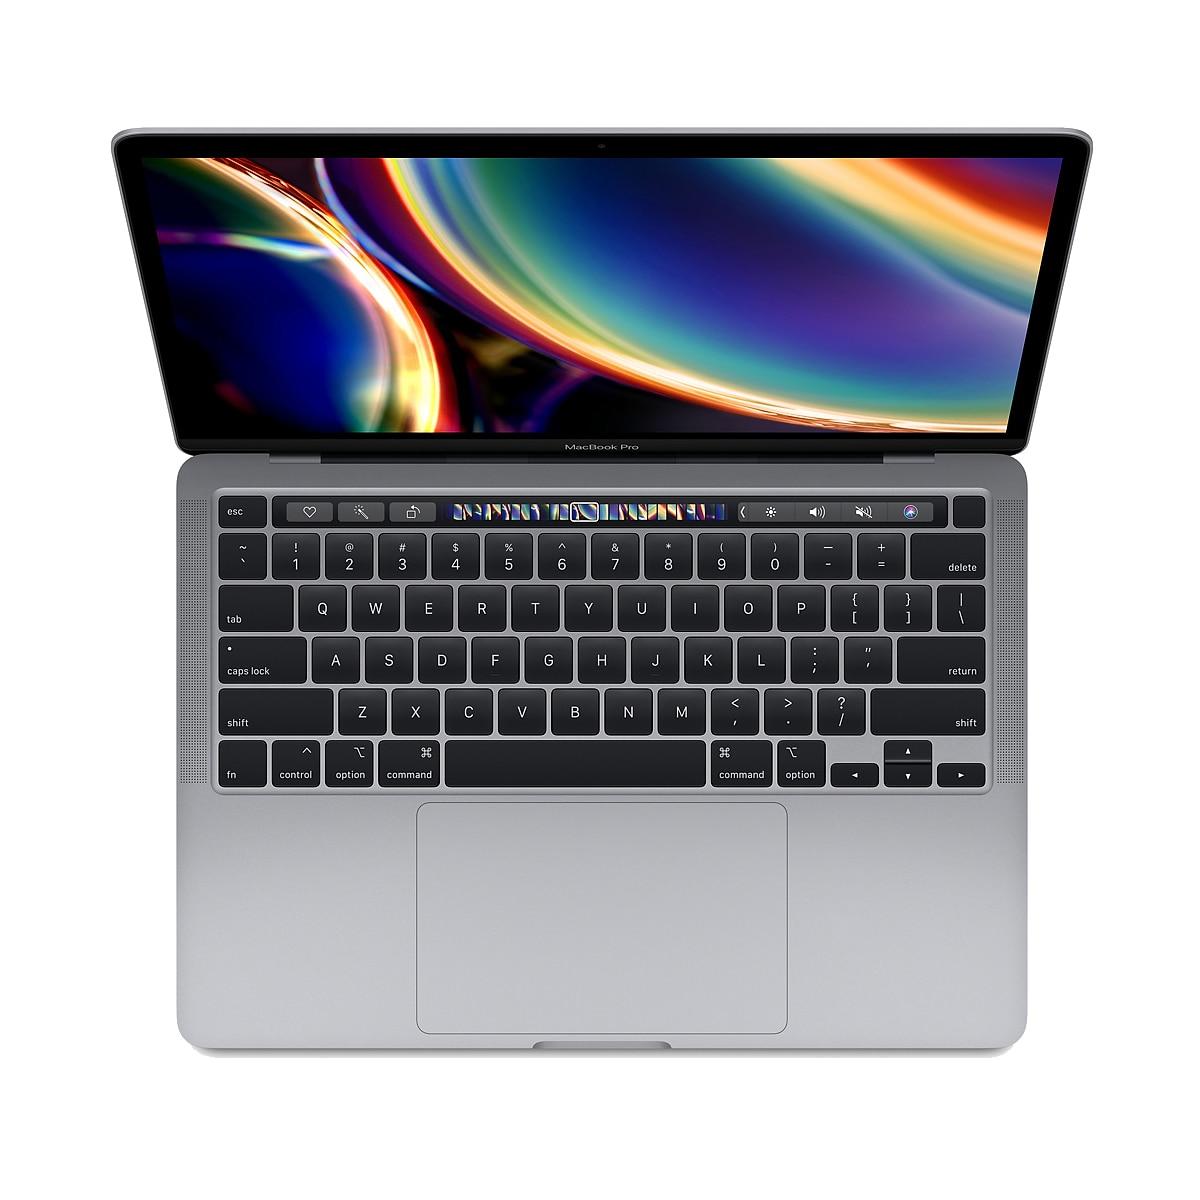 MacBook Pro 13-inch i7 2.3GHz Processore, 32GB Memory 1TB Hard Drive Space Gray